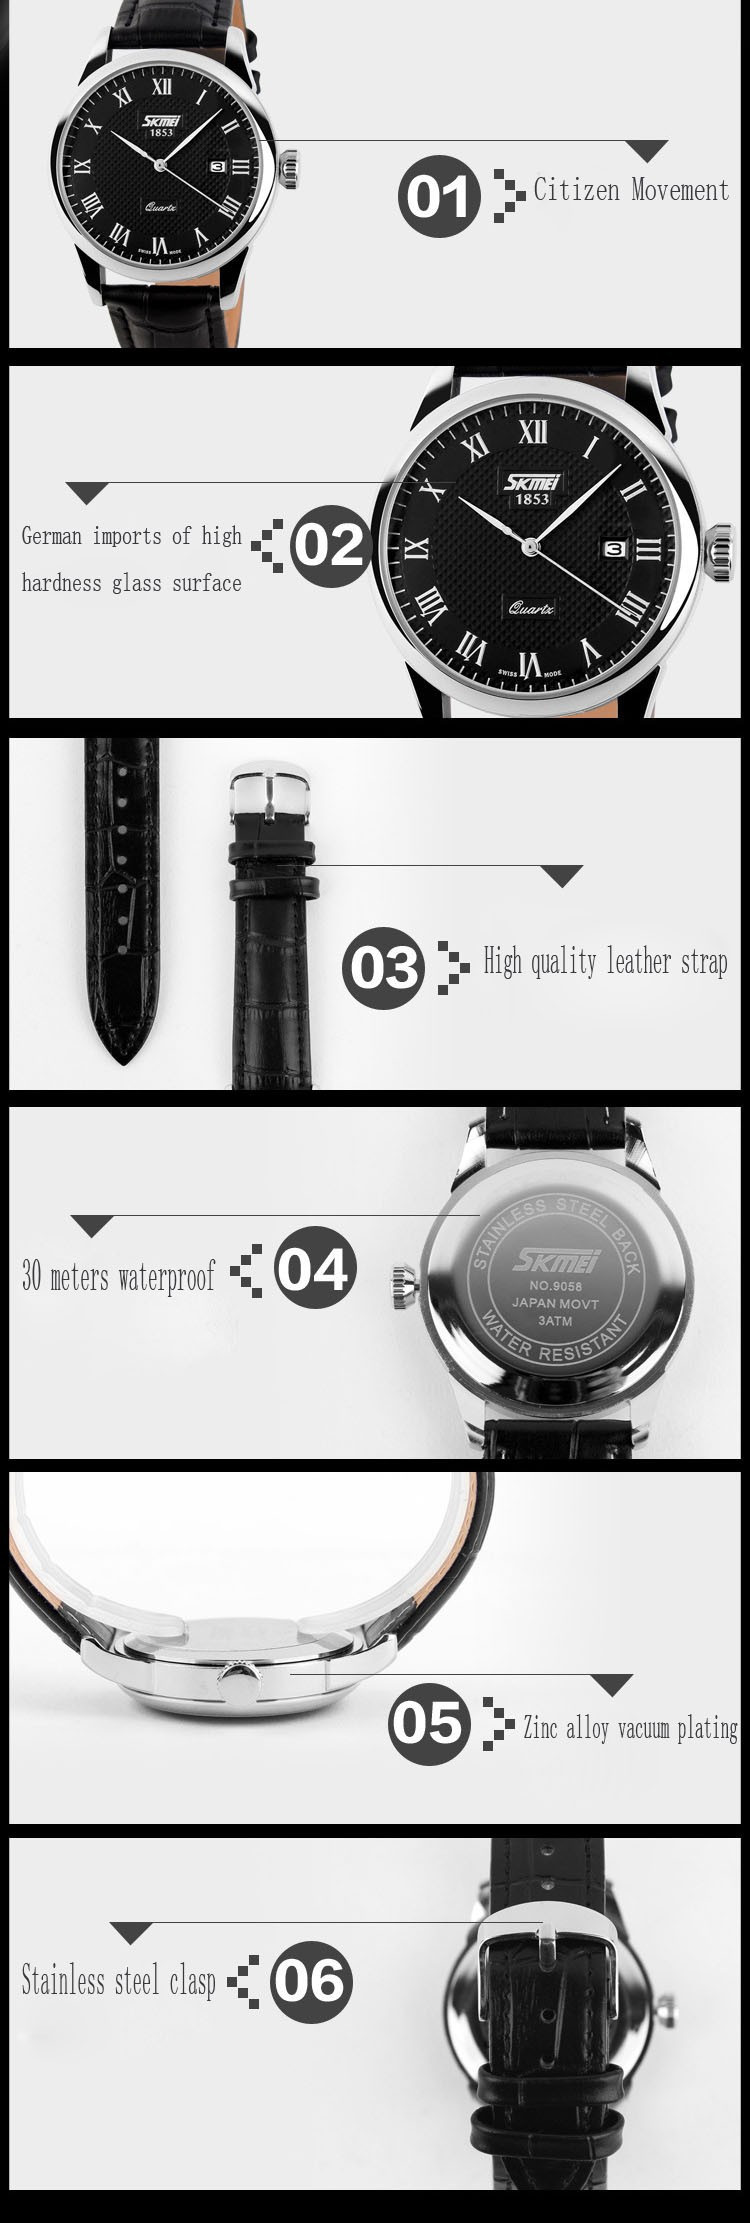 SKMEI Марка 9058 Кварц Часы Женщины Авто дата Наручные Часы Кожаный Ремешок Женские Часы